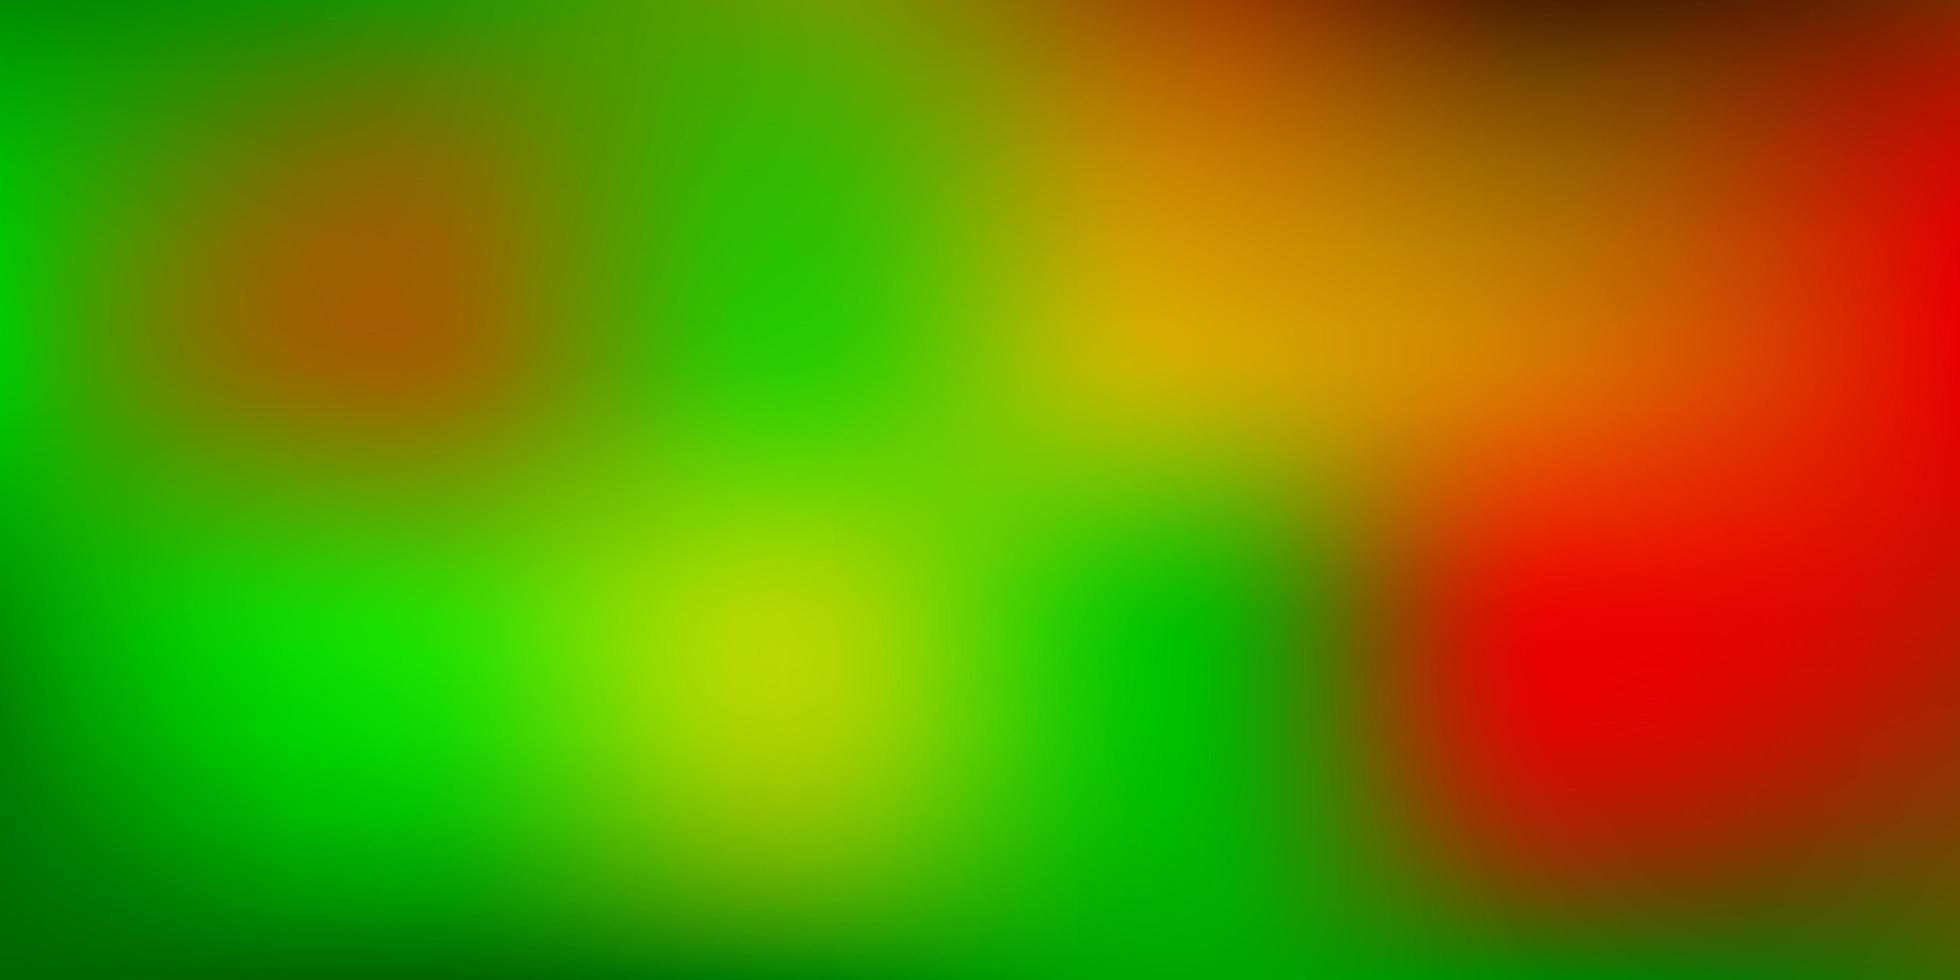 textura turva vector verde e amarelo escuro.